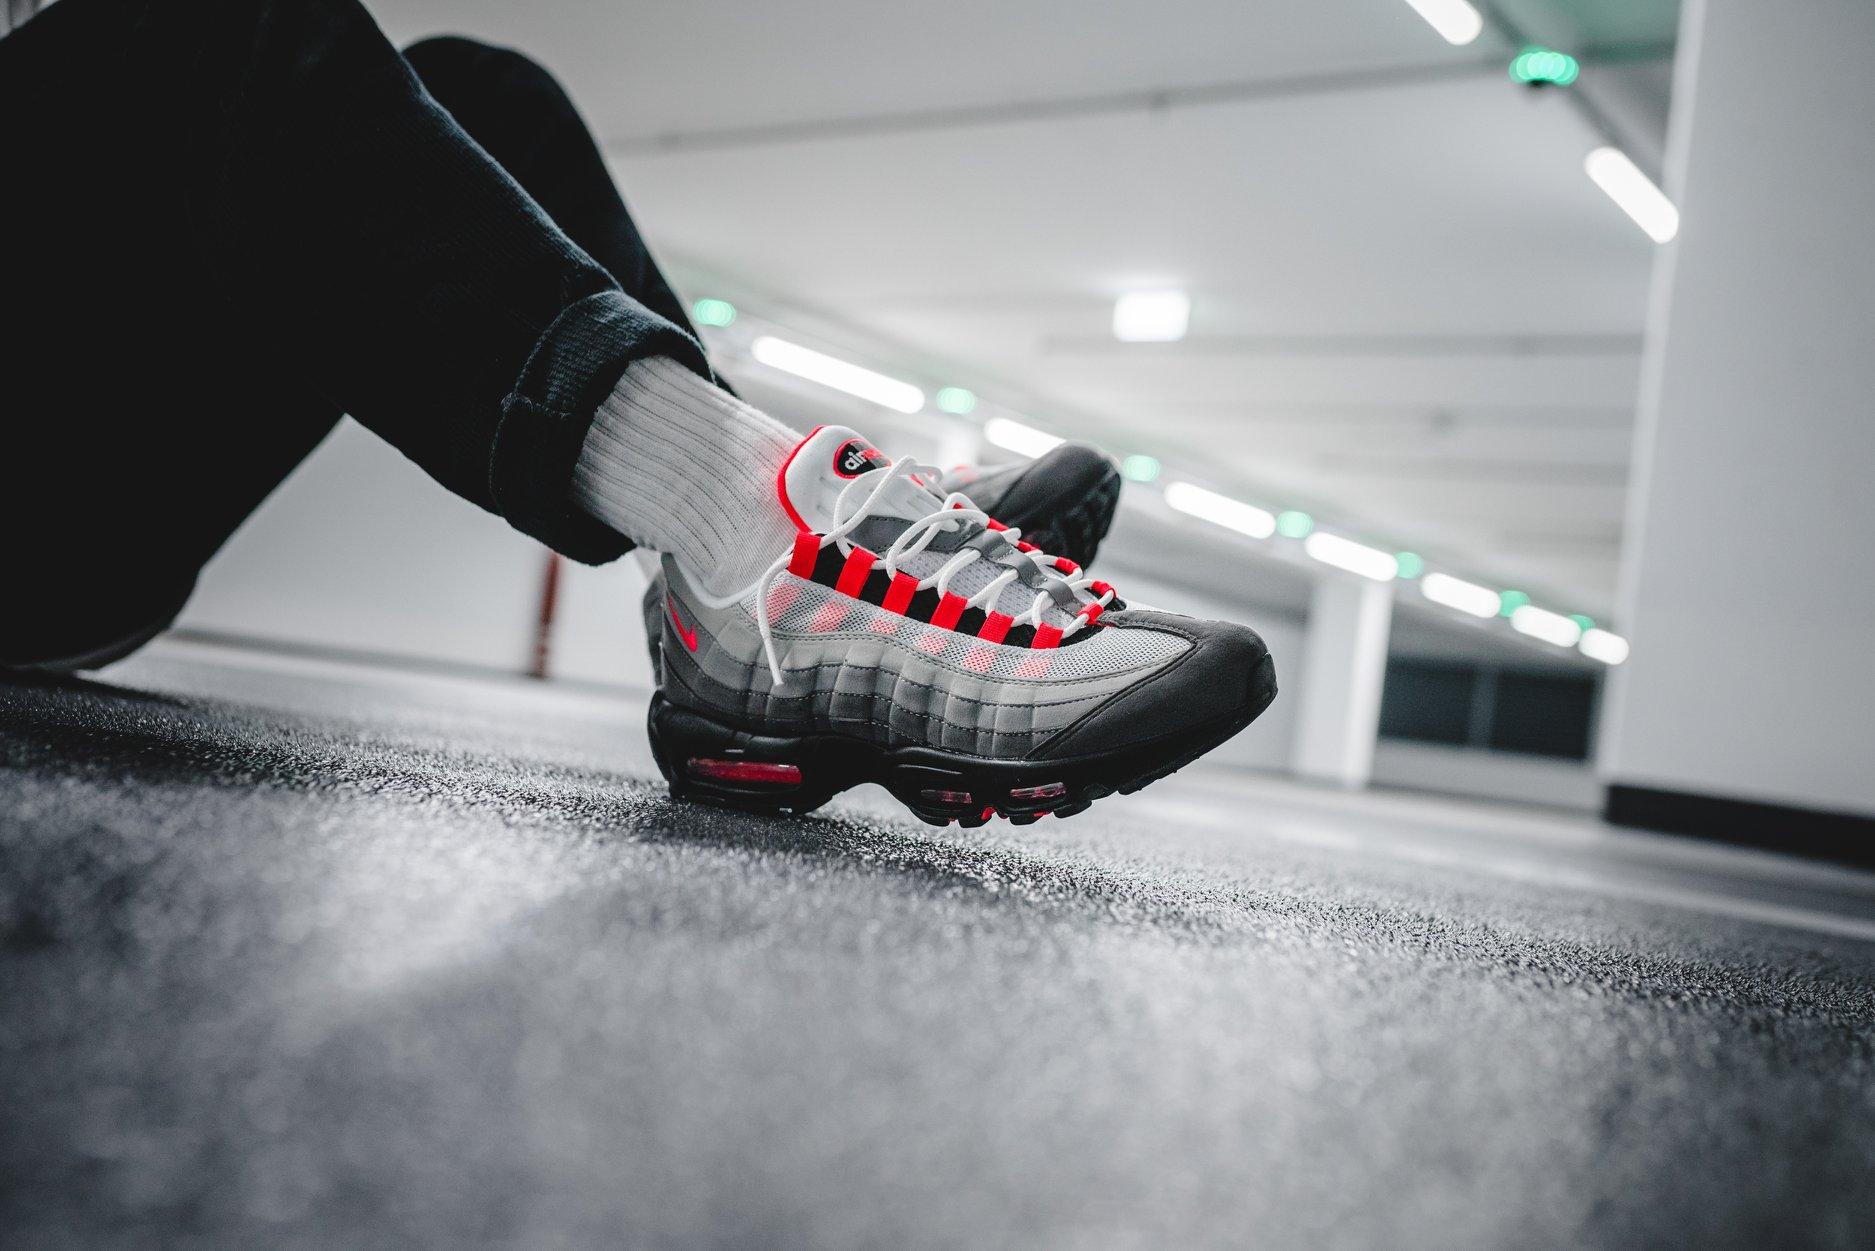 buy online 5c11d 4c2b8 Nike Air Max 95 Solar Red Arriving Next Week • KicksOnFire.com